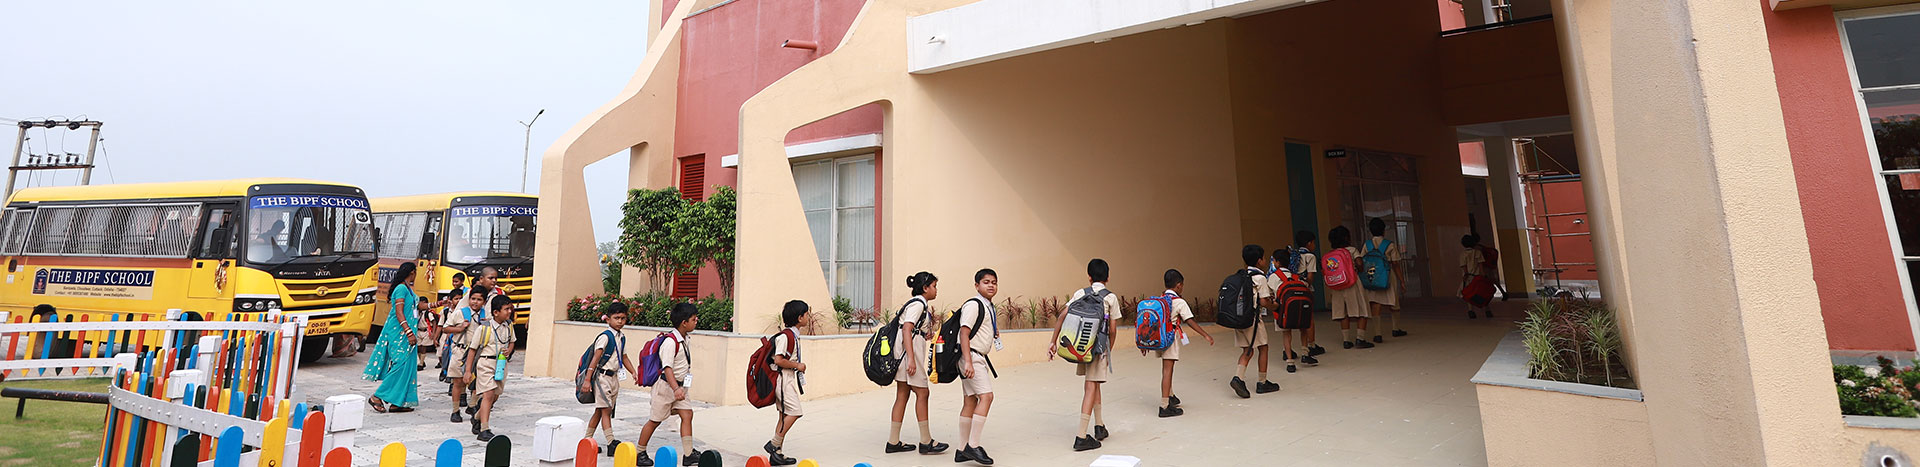 The BIPF School